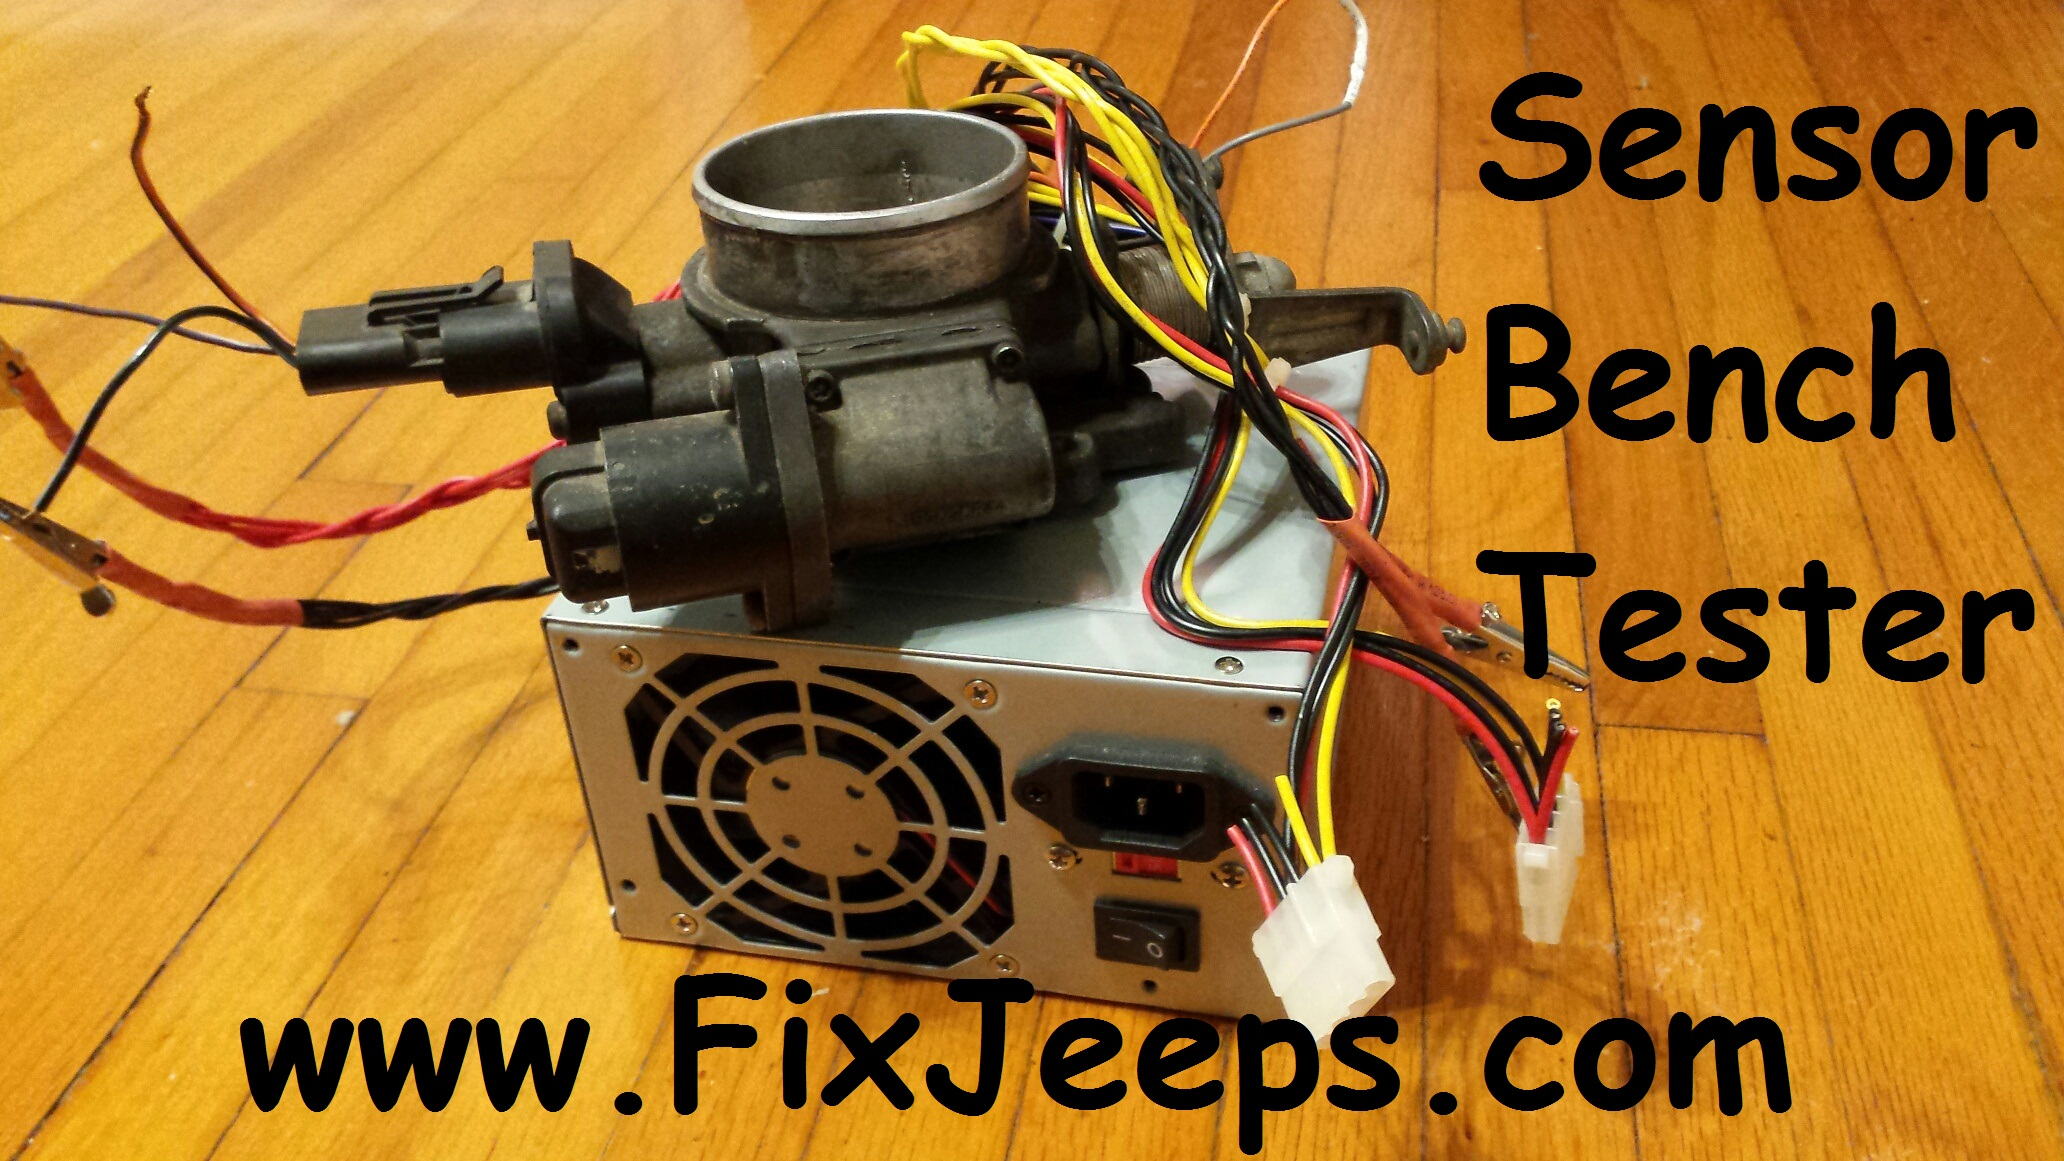 Bench top Jeep sensor tester